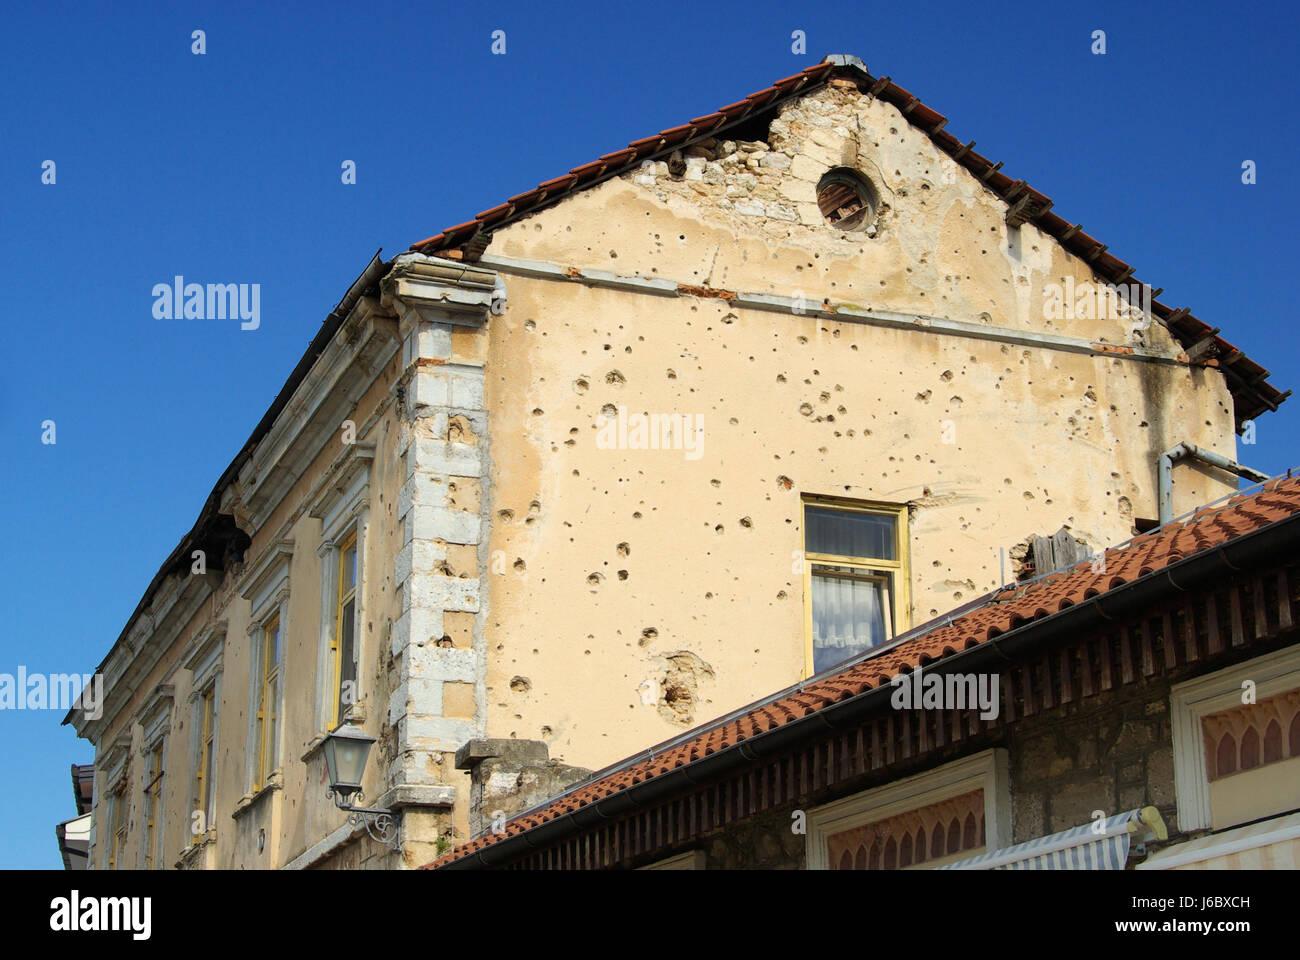 krieg ruine zerst rung loch kroatien b rgerkrieg bosnien hausbau stadt stockfoto bild. Black Bedroom Furniture Sets. Home Design Ideas